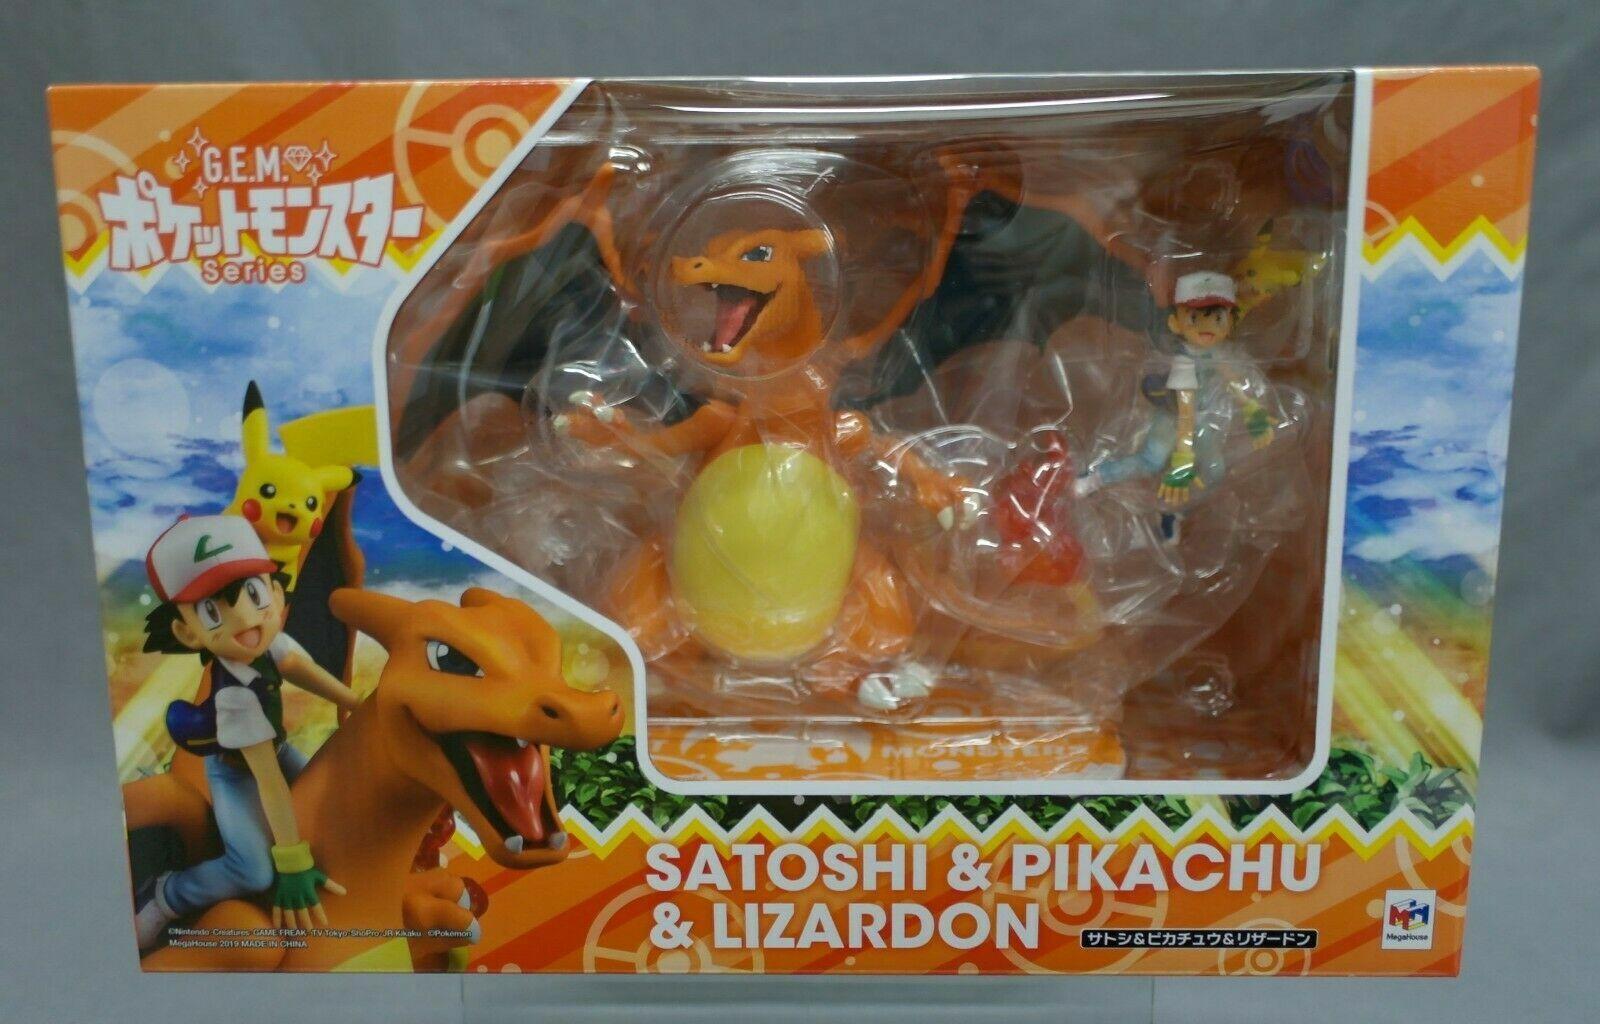 GEM G.E.M. Series Pokemon Ash Ketchum Pikachu & Charizard MegaHouse Japan NEW